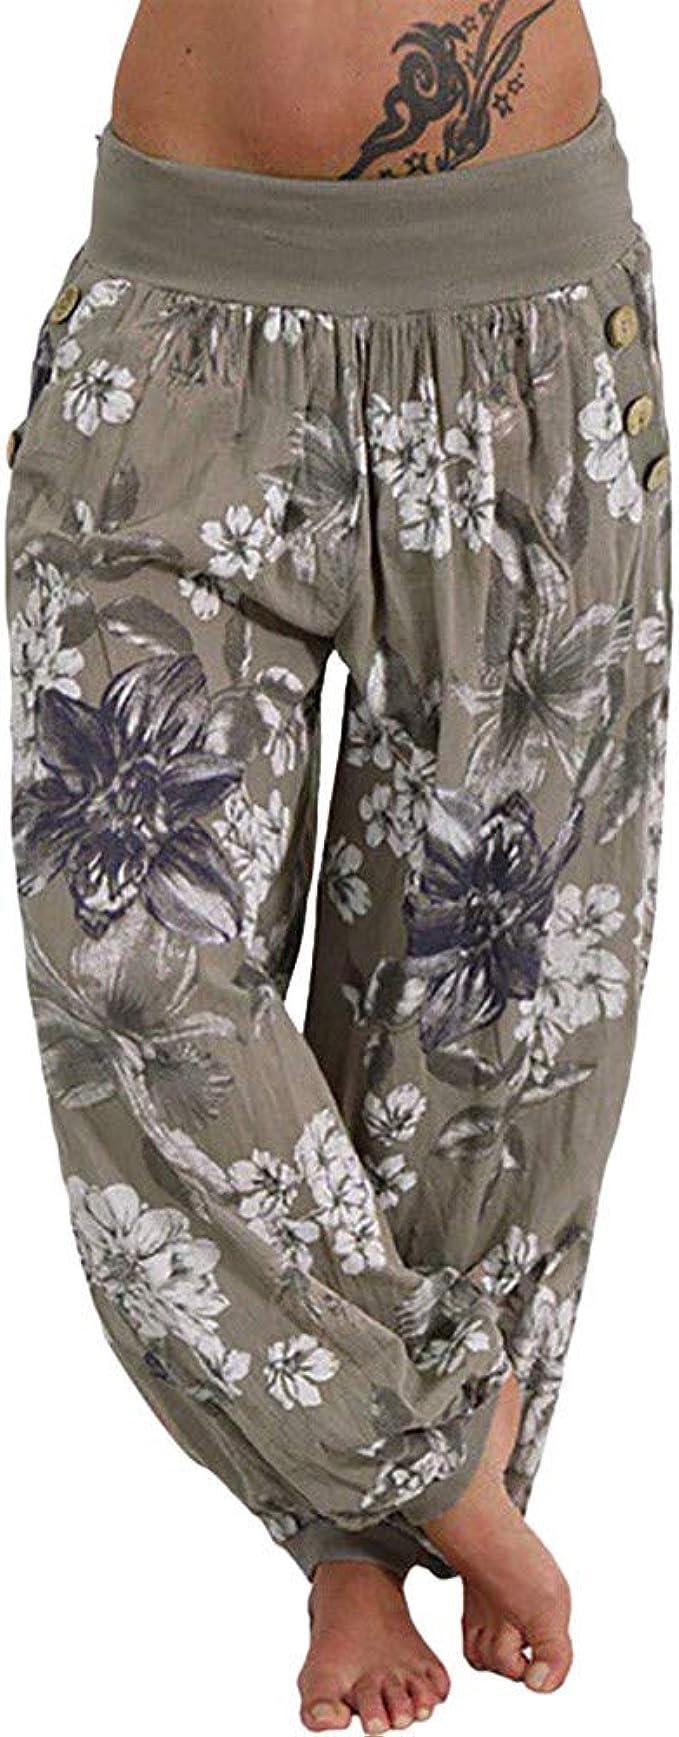 ITALIAN Lagenlook Boho Hippy Harem Pants Lounge Trousers Yoga Size 10-16